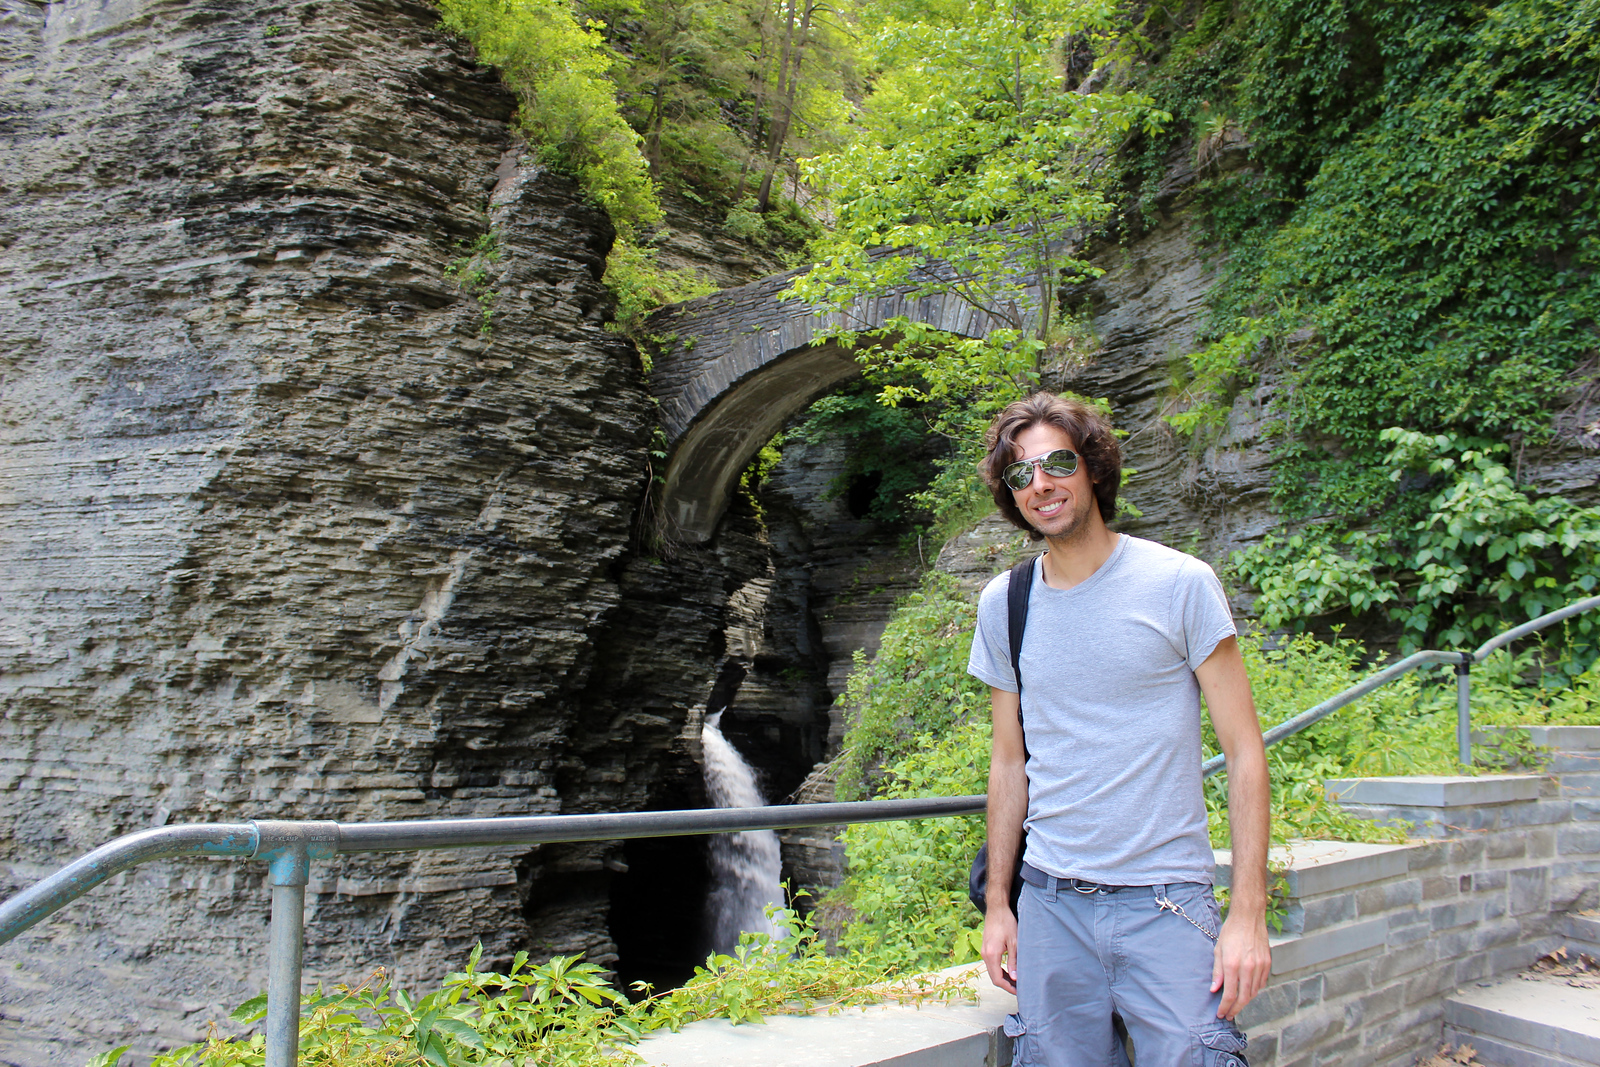 Watkins Glen State Park Gorge - Hiking in Watkins Glen NY